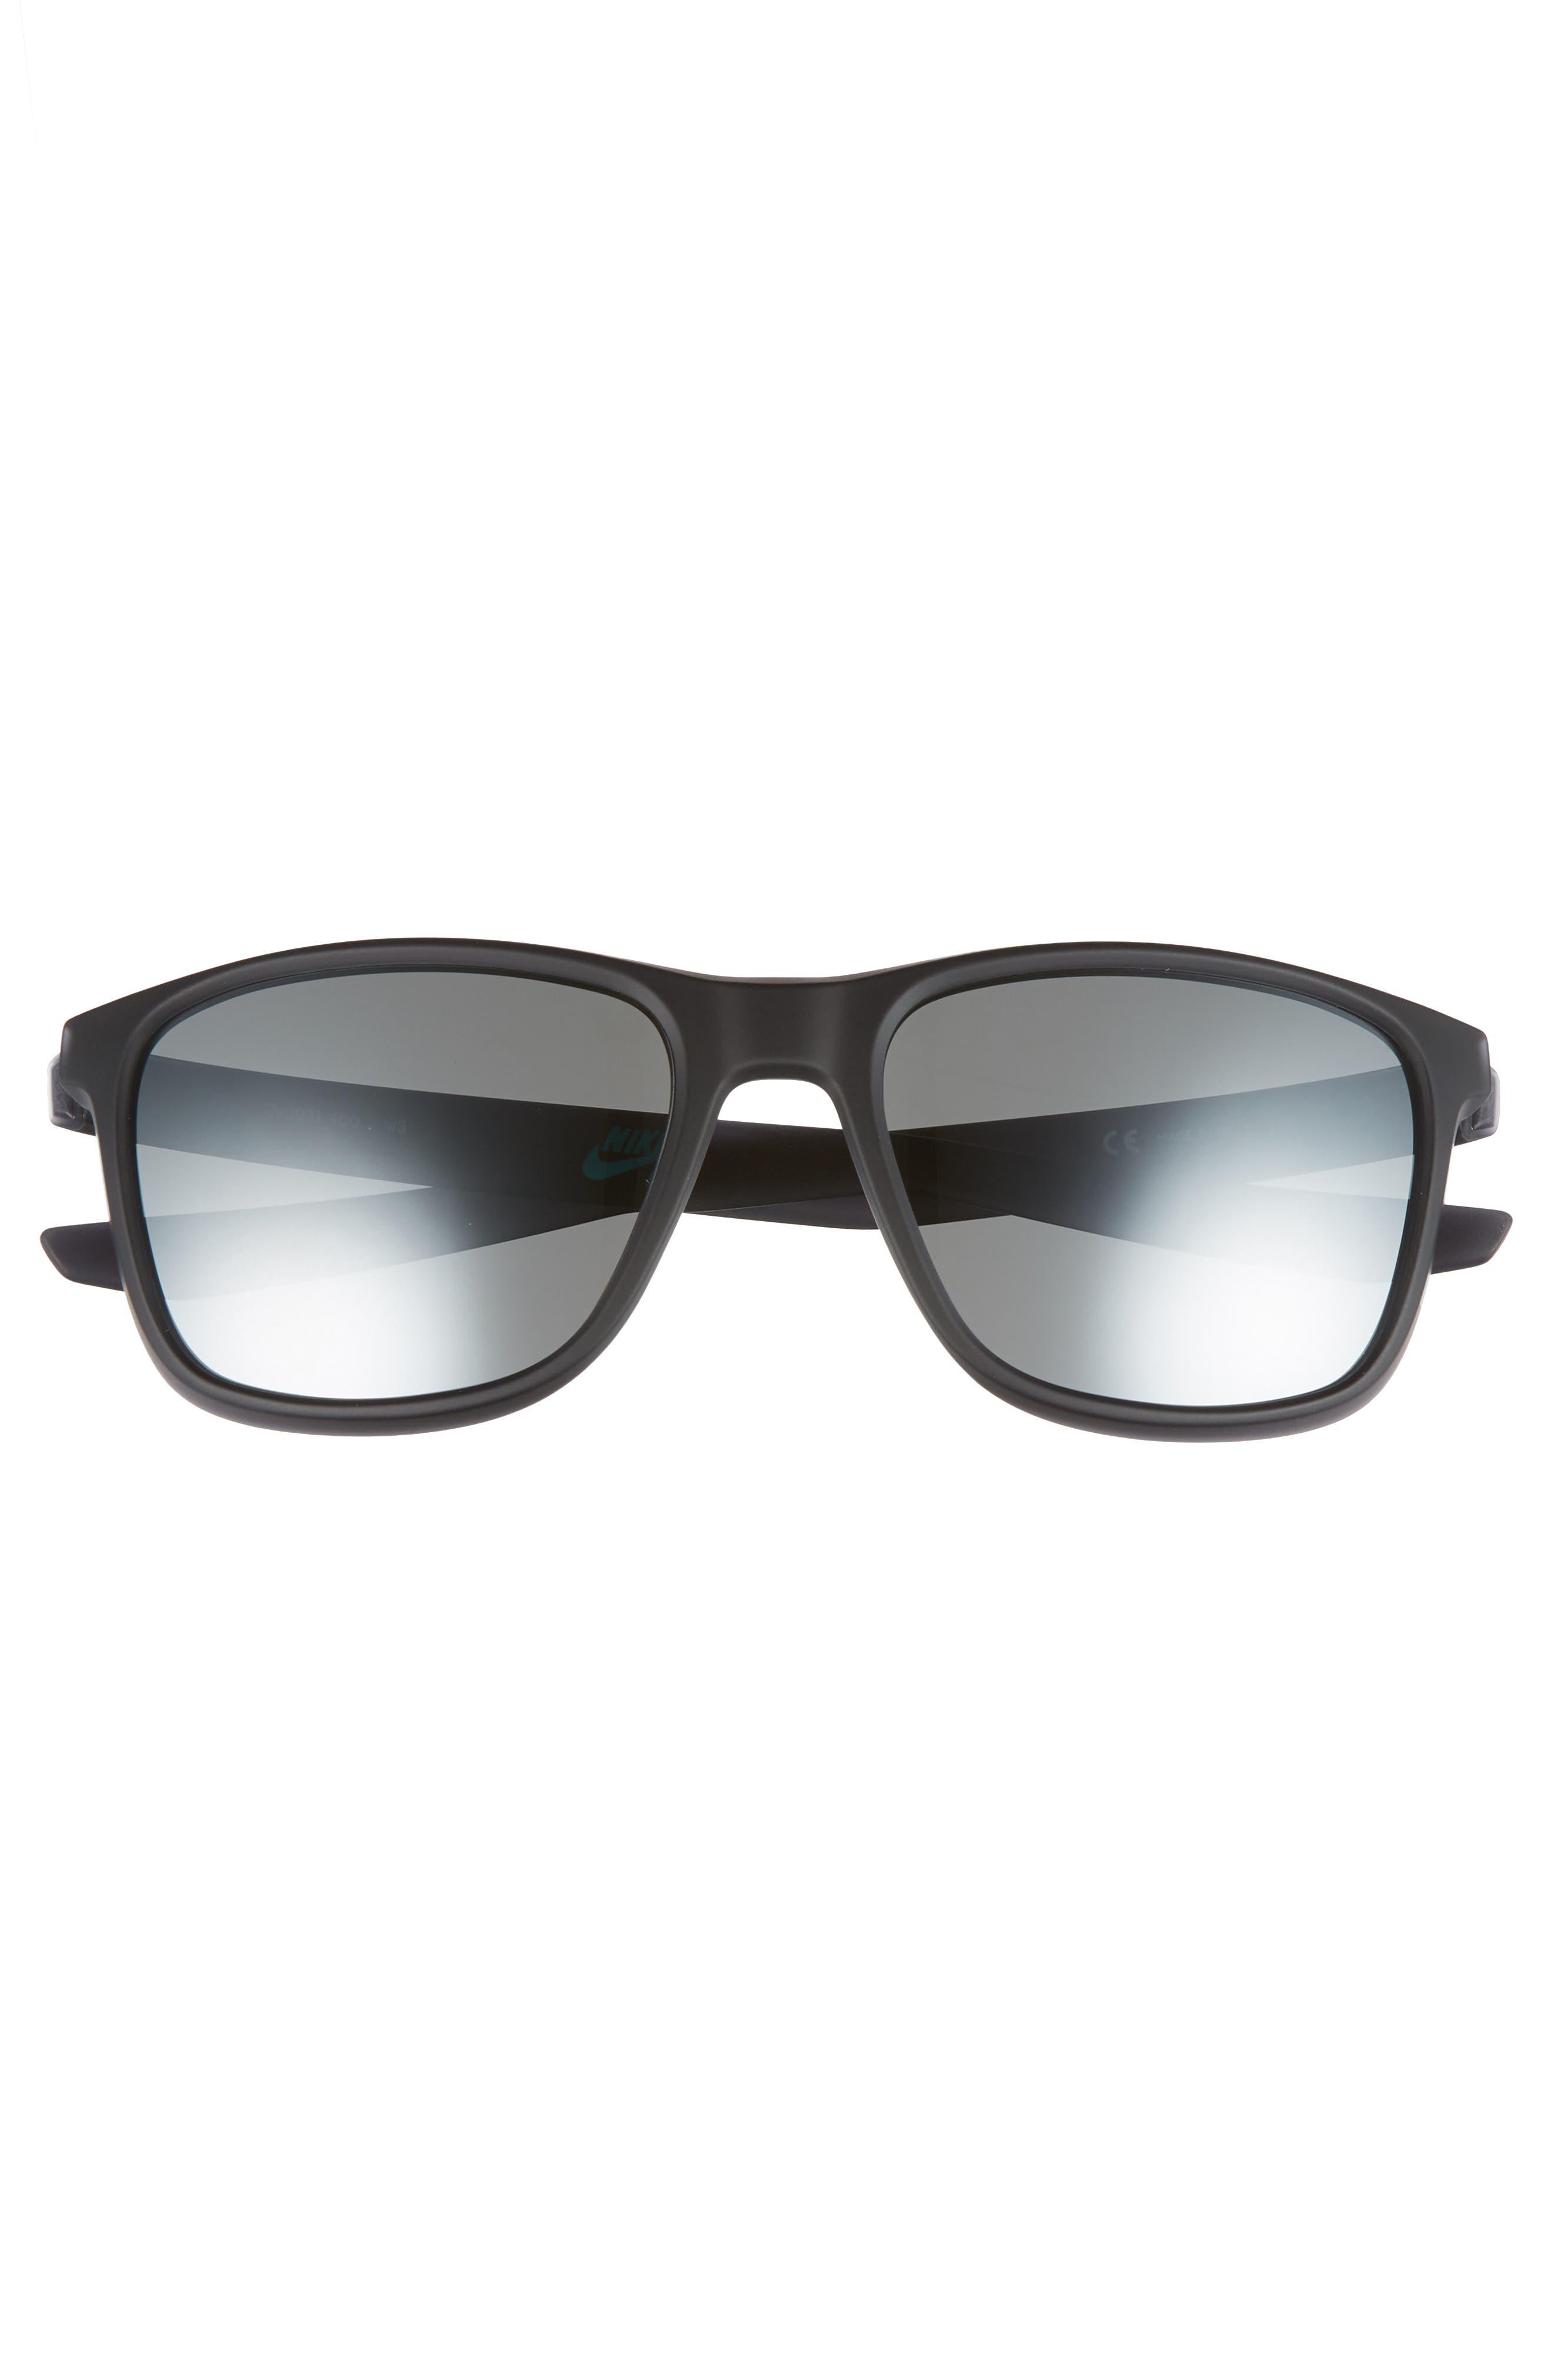 Unrest 57mm Sunglasses,                             Alternate thumbnail 2, color,                             Matte Obsidian/ Grey Silver